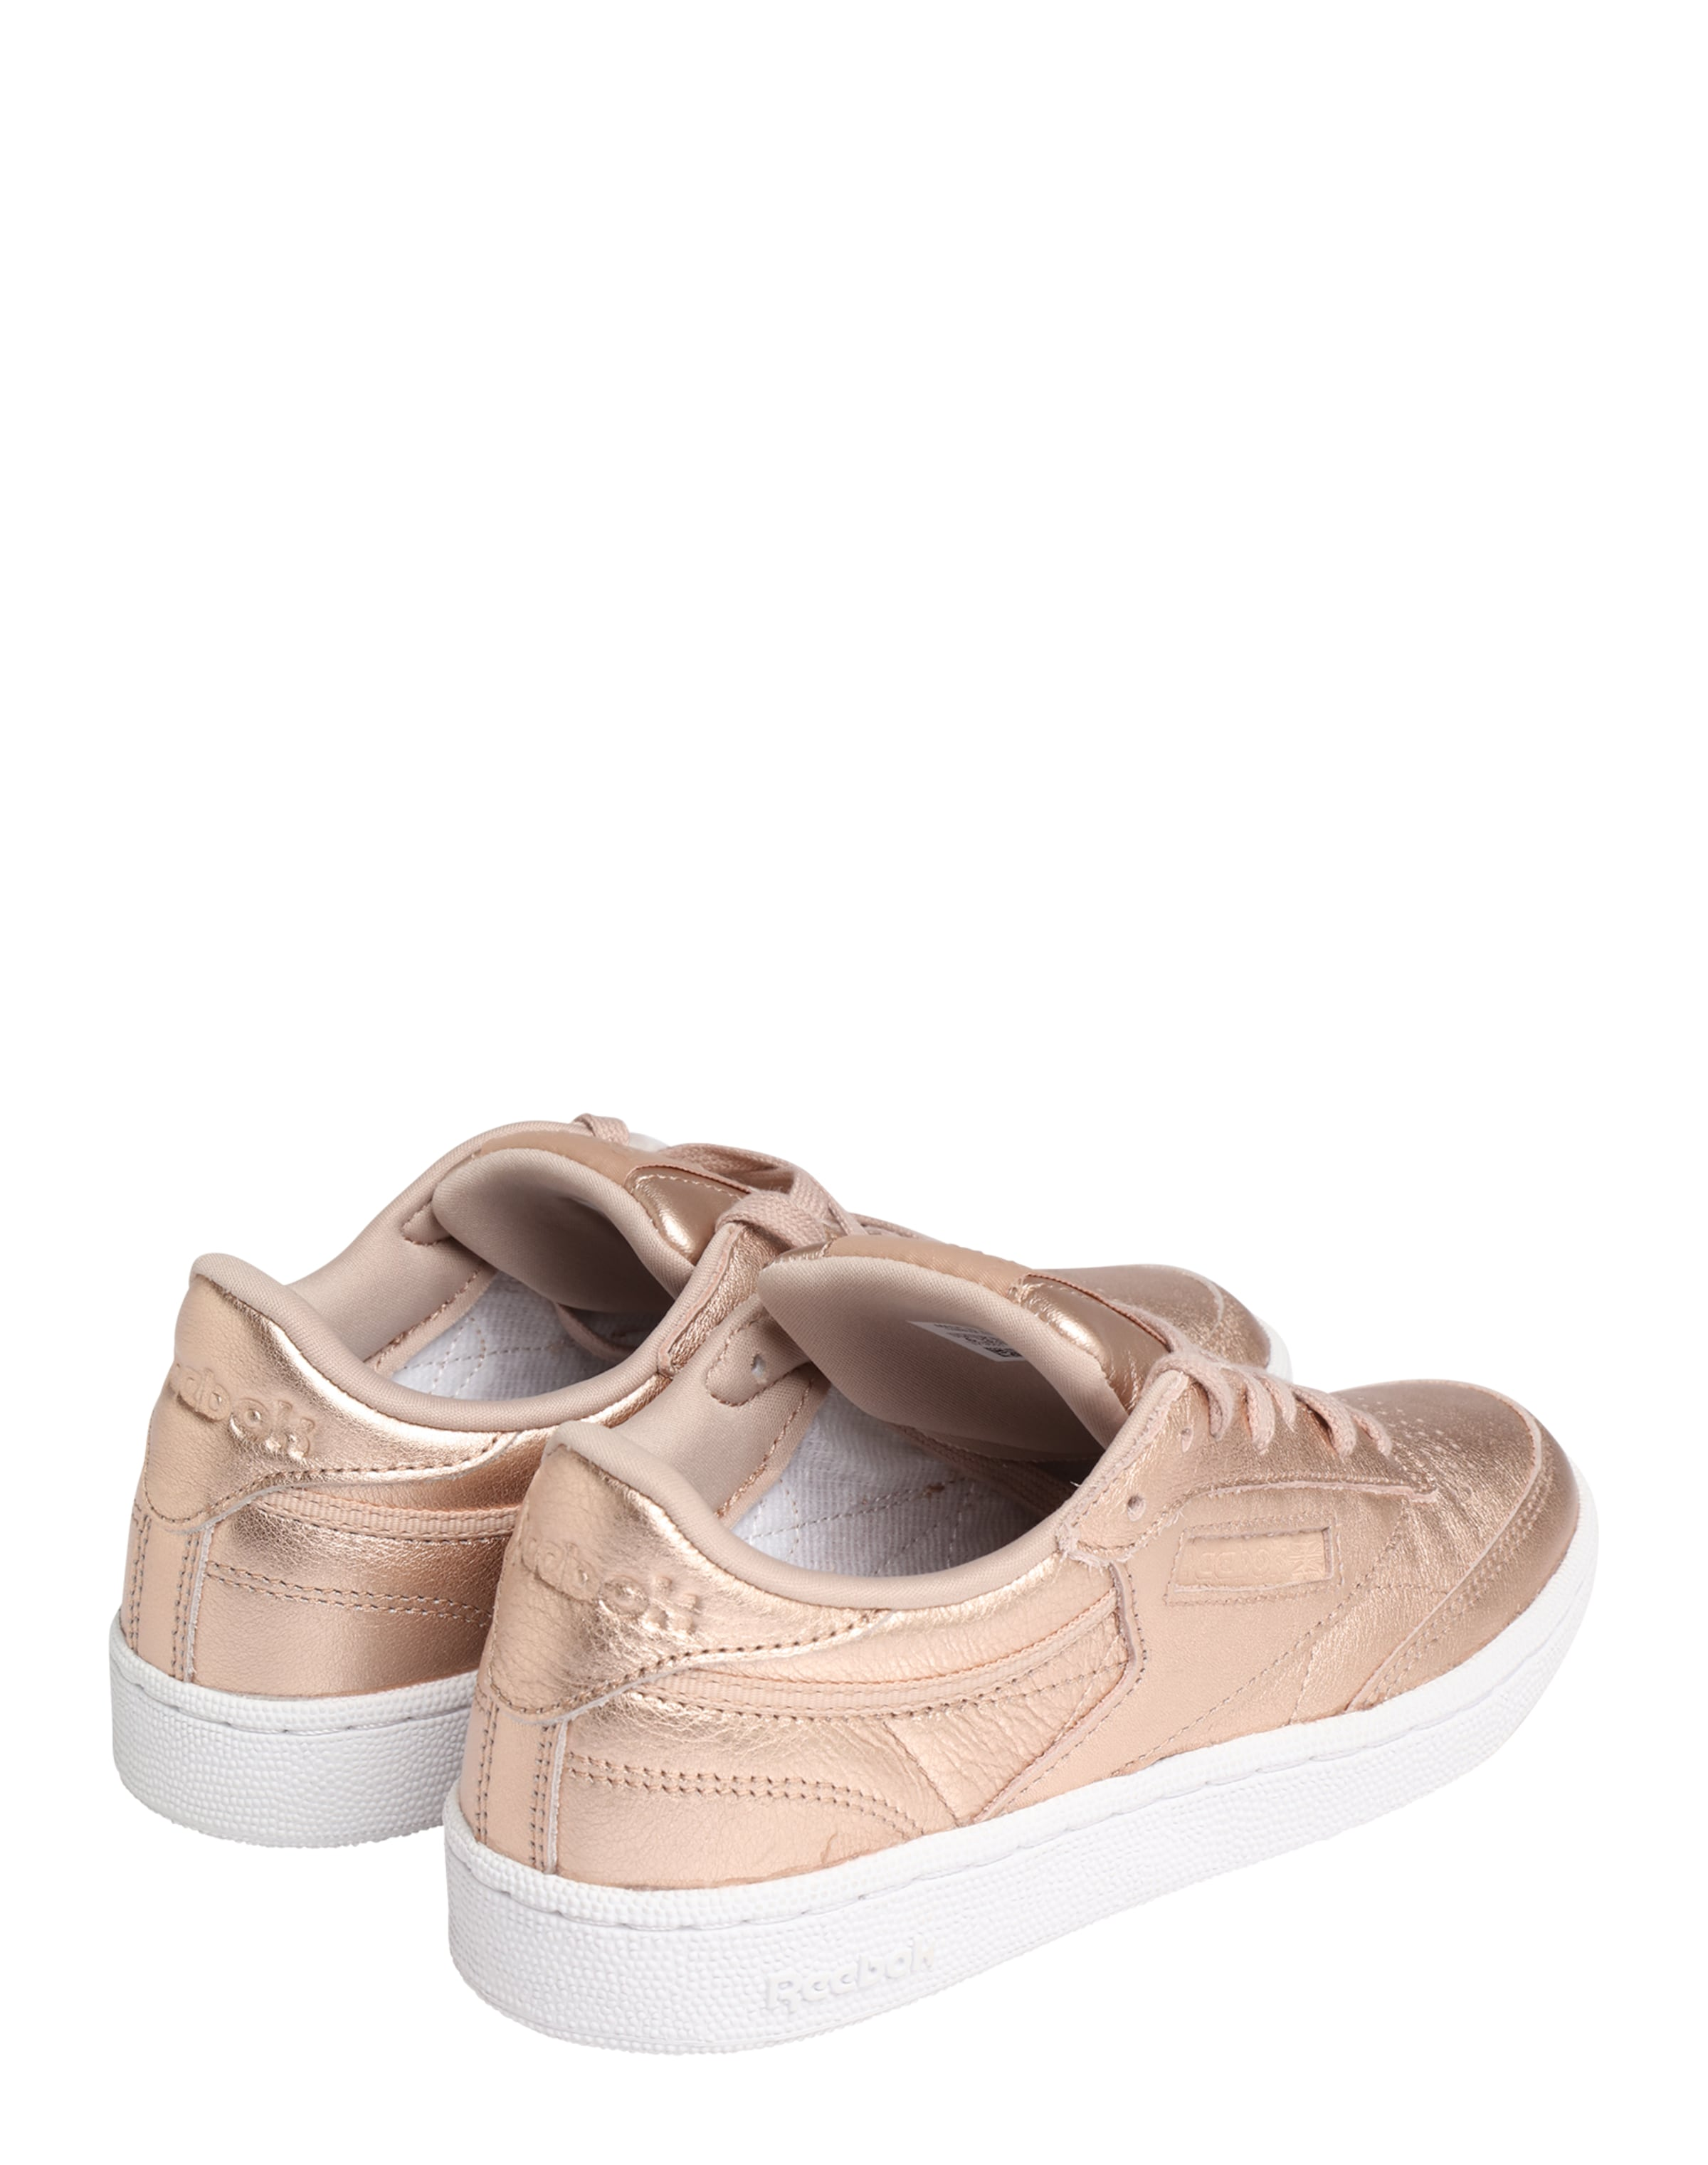 Reebok classic Sneaker 'Club C85 Melted Pearl' Billig Verkauf Online p8McR7V3HD